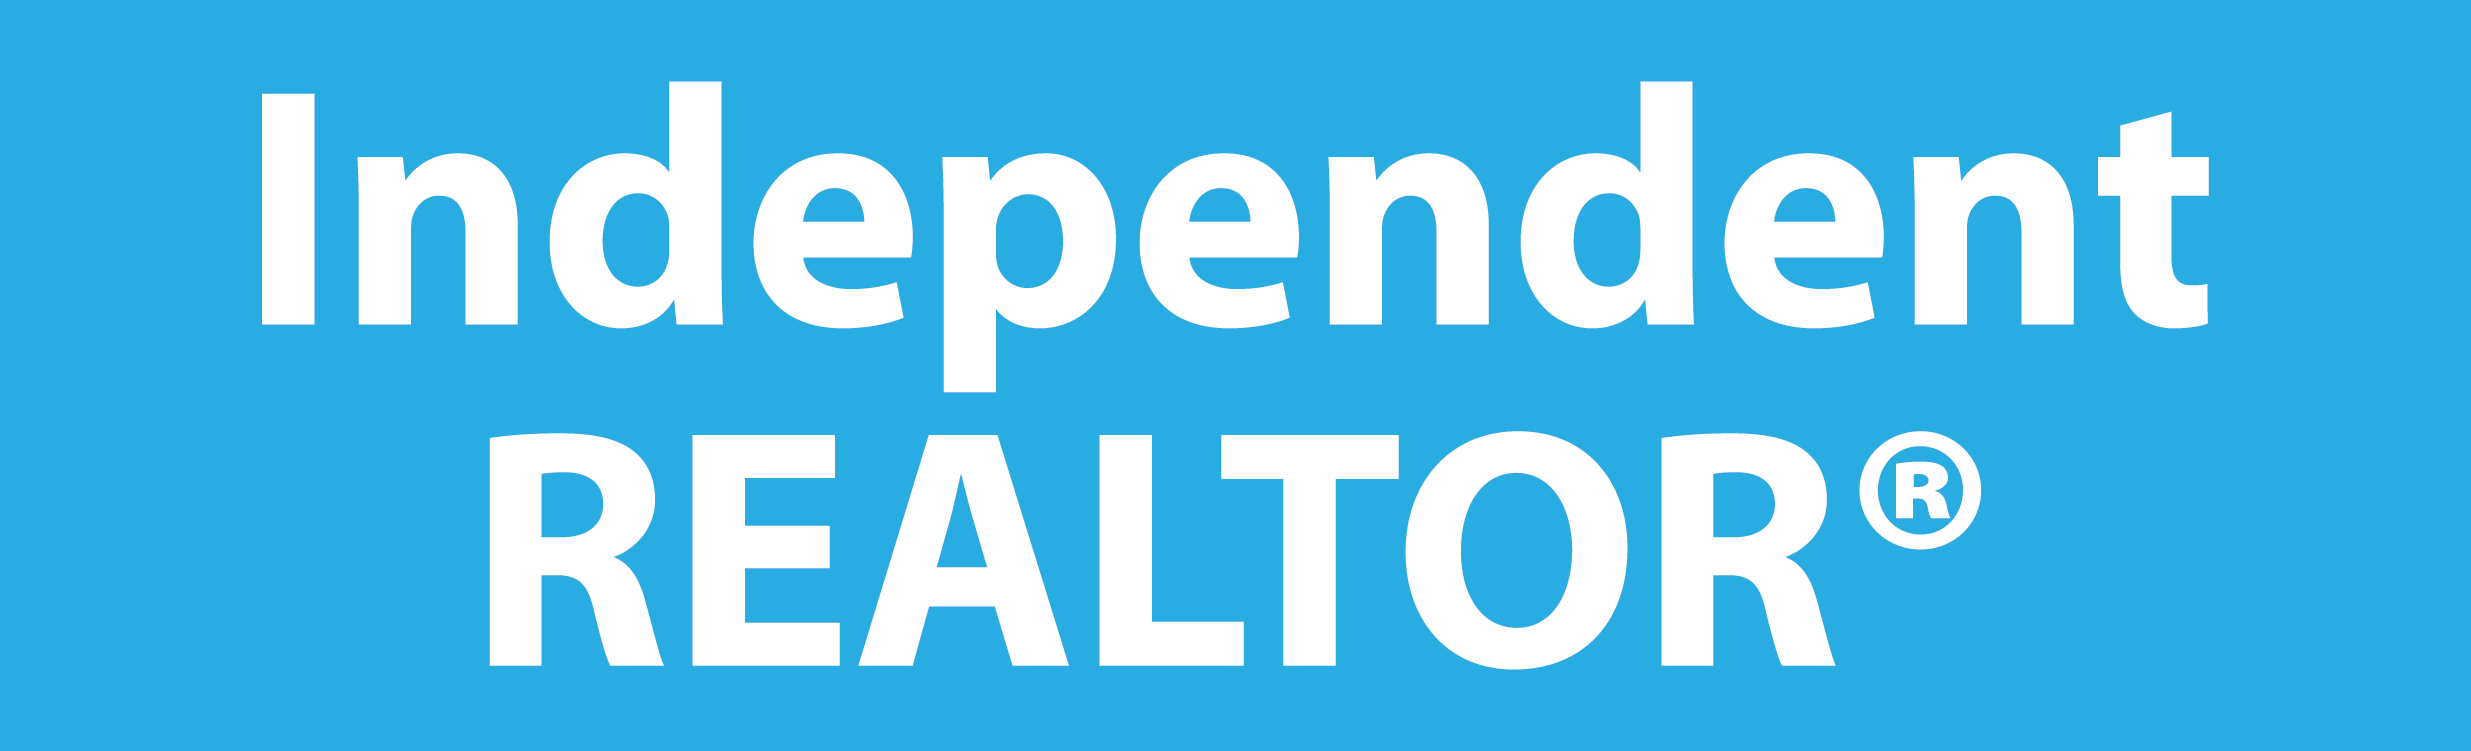 Independent-Realtor.png